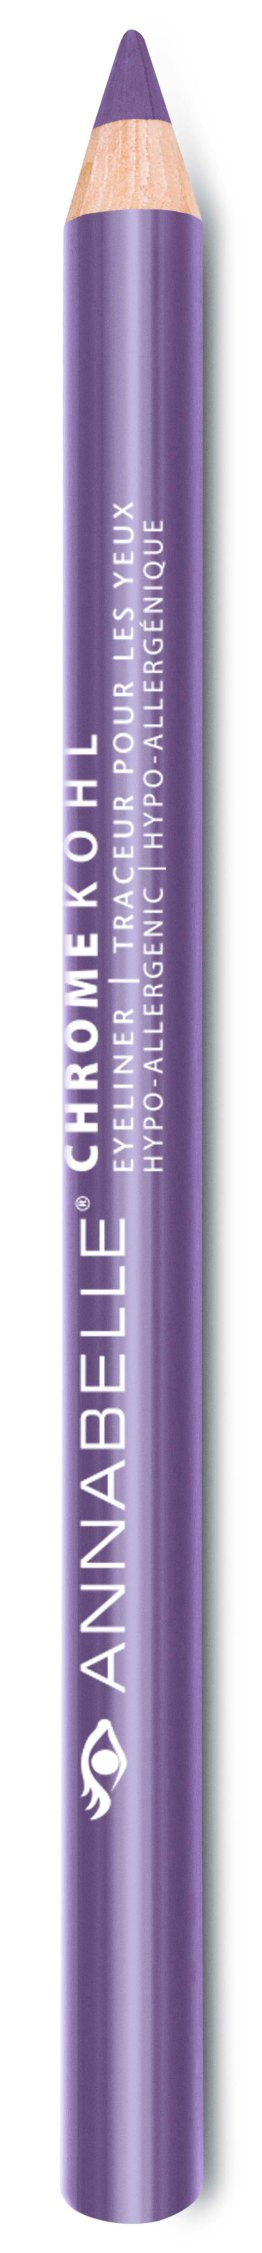 CHROME KOHL - Purple Daze